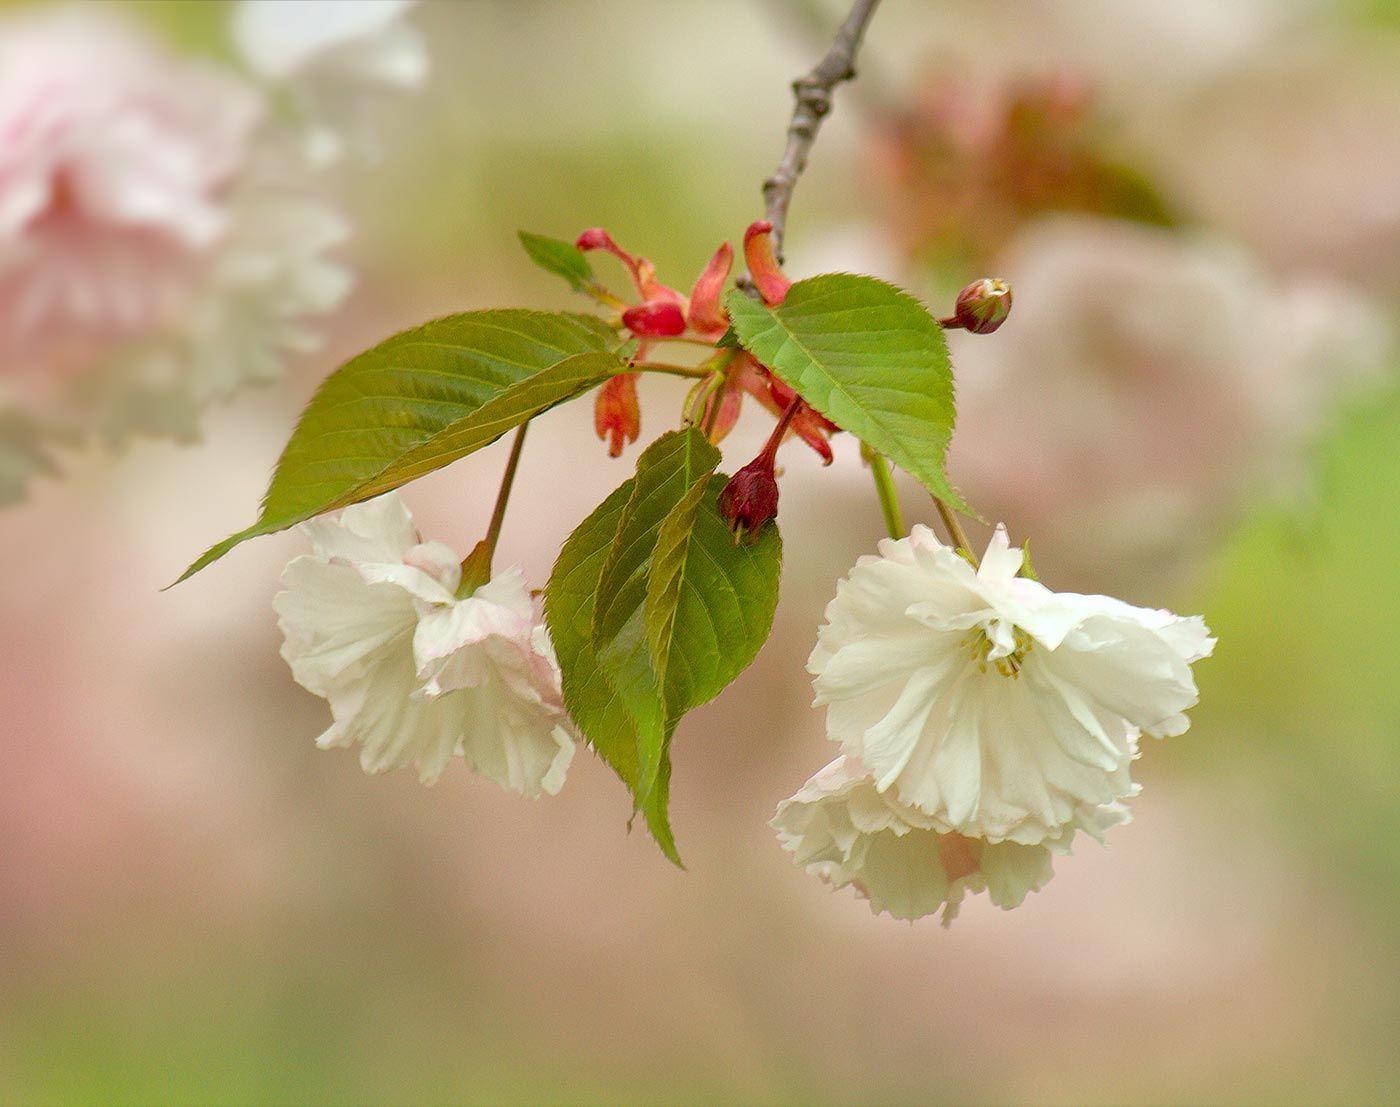 Branch Brook Park Cherry Blossom Festival 2020 Splurgefrugal Com Blossom Cherry Blossom Festival Cherry Blossom